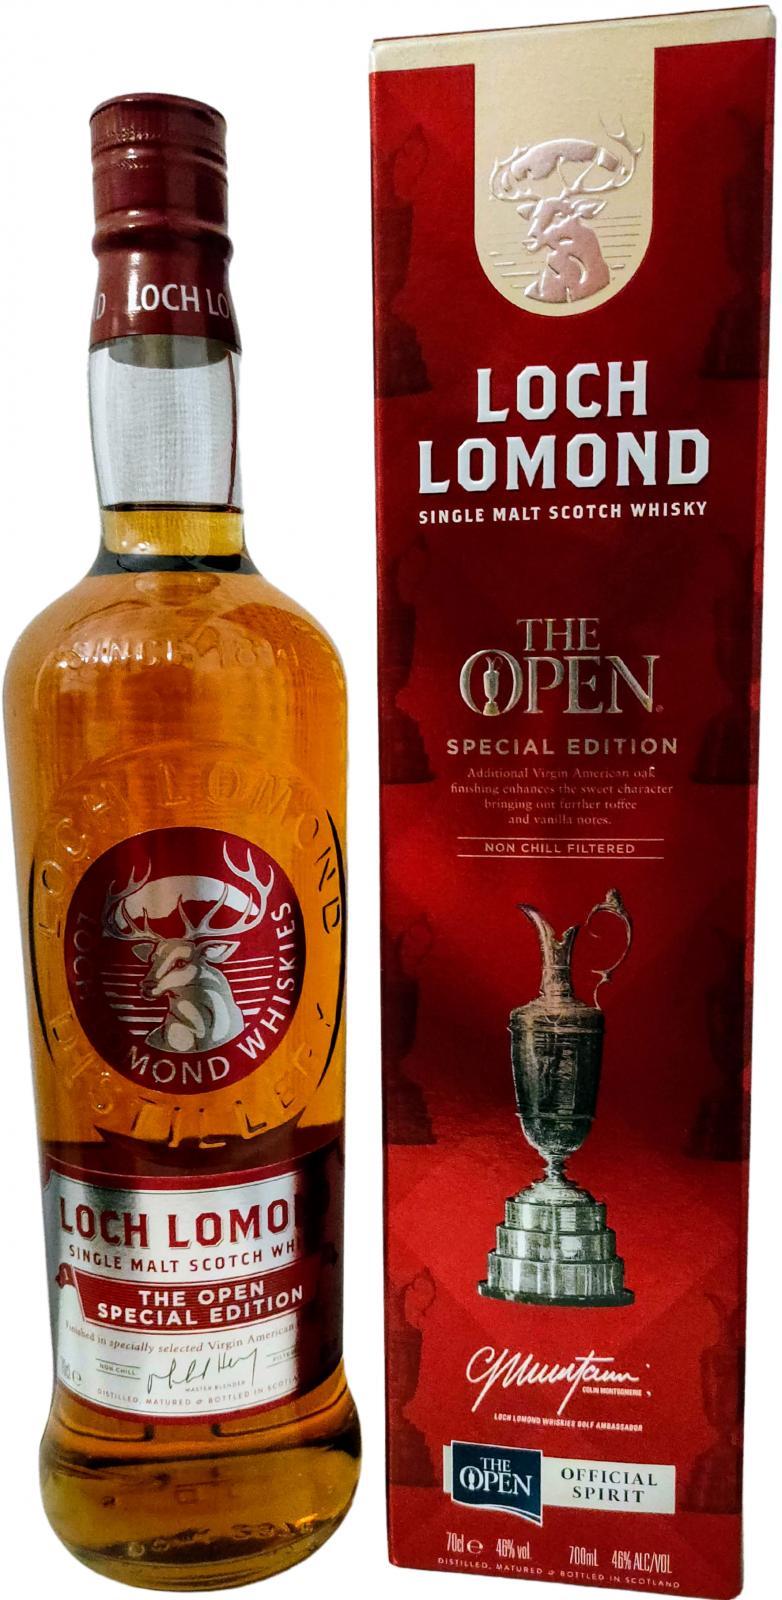 Loch Lomond The Open - Special Edition